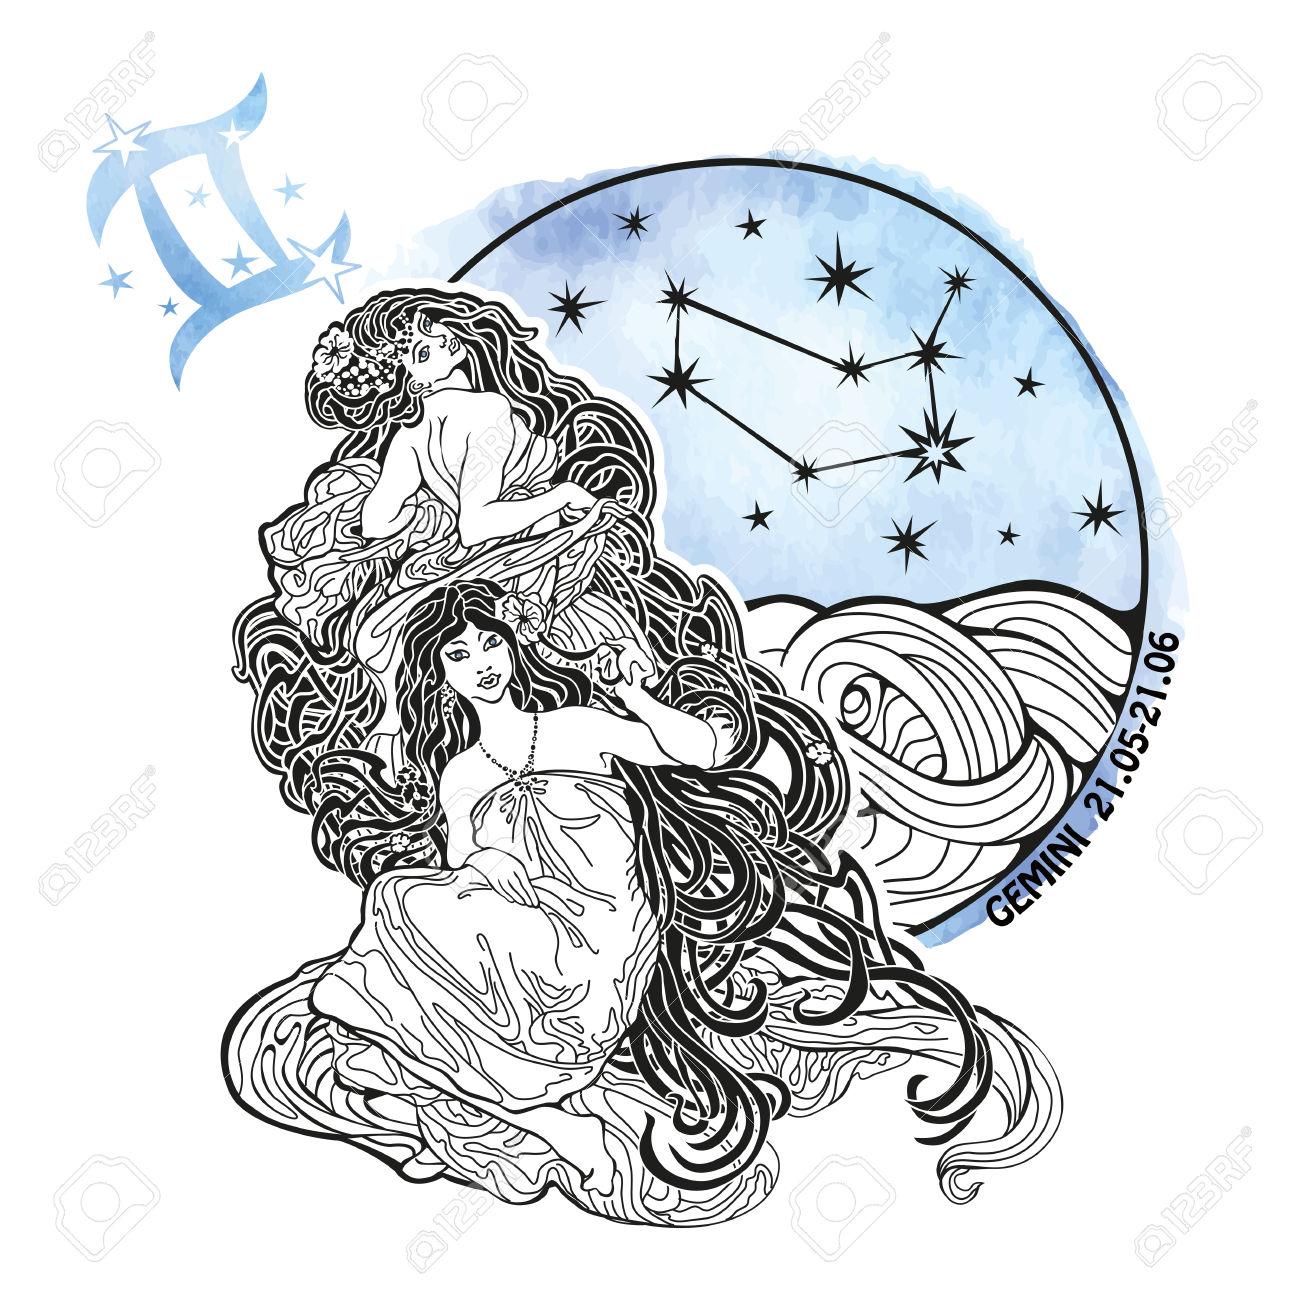 Gemini Zodiac Sign .Horoscope Constellation,stars In Circle.